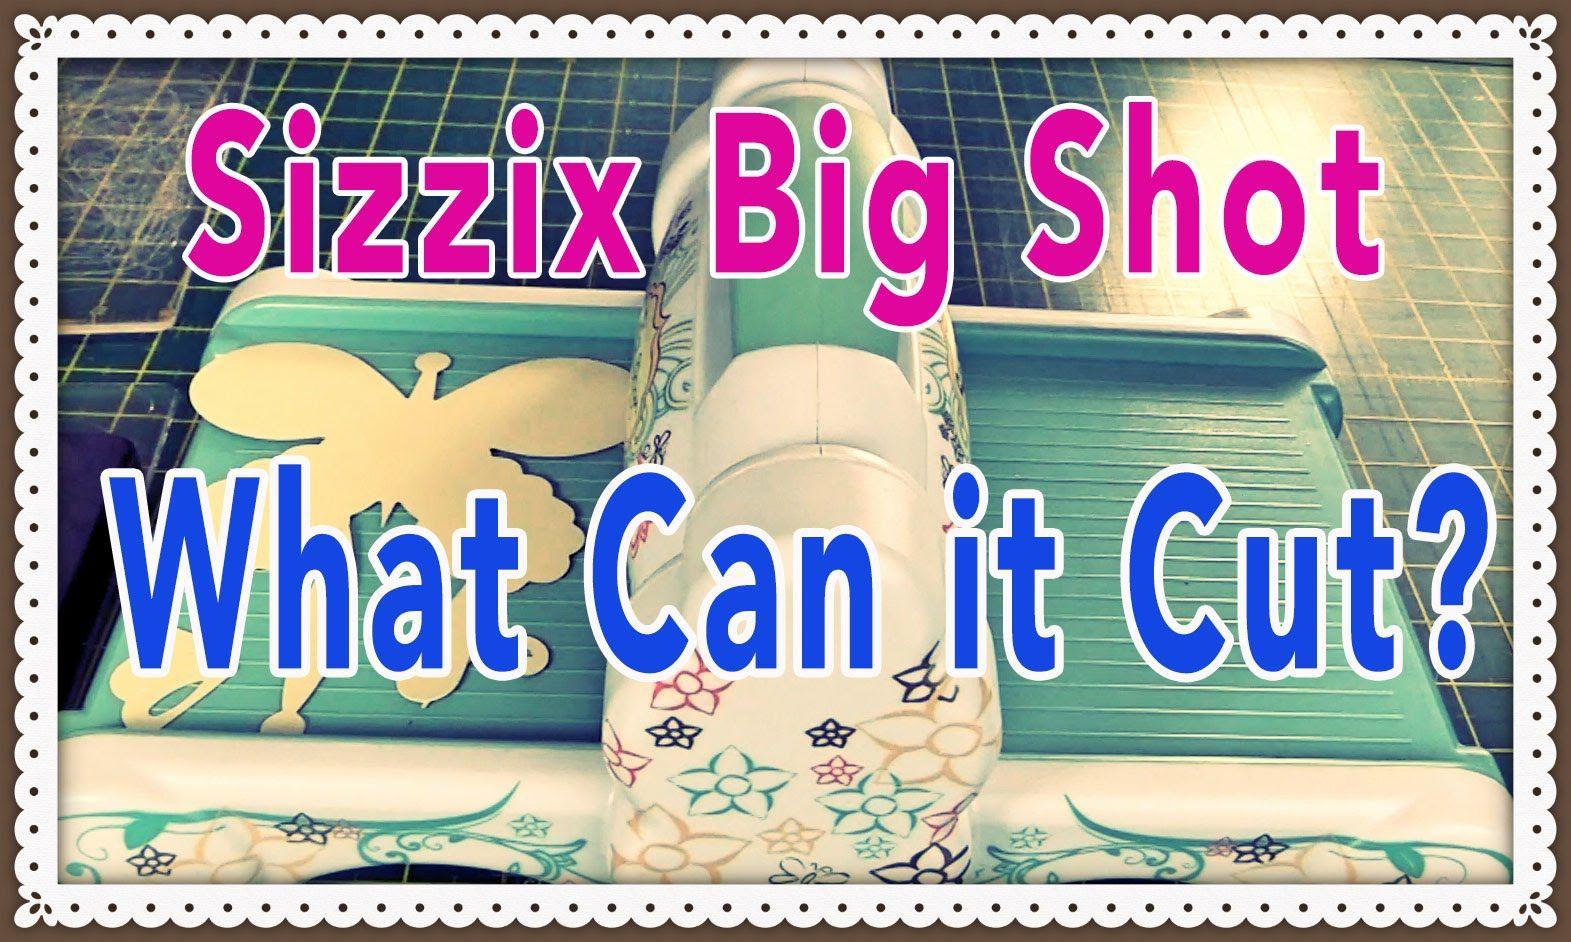 Sizzix Big Shot:  What Can It Cut?